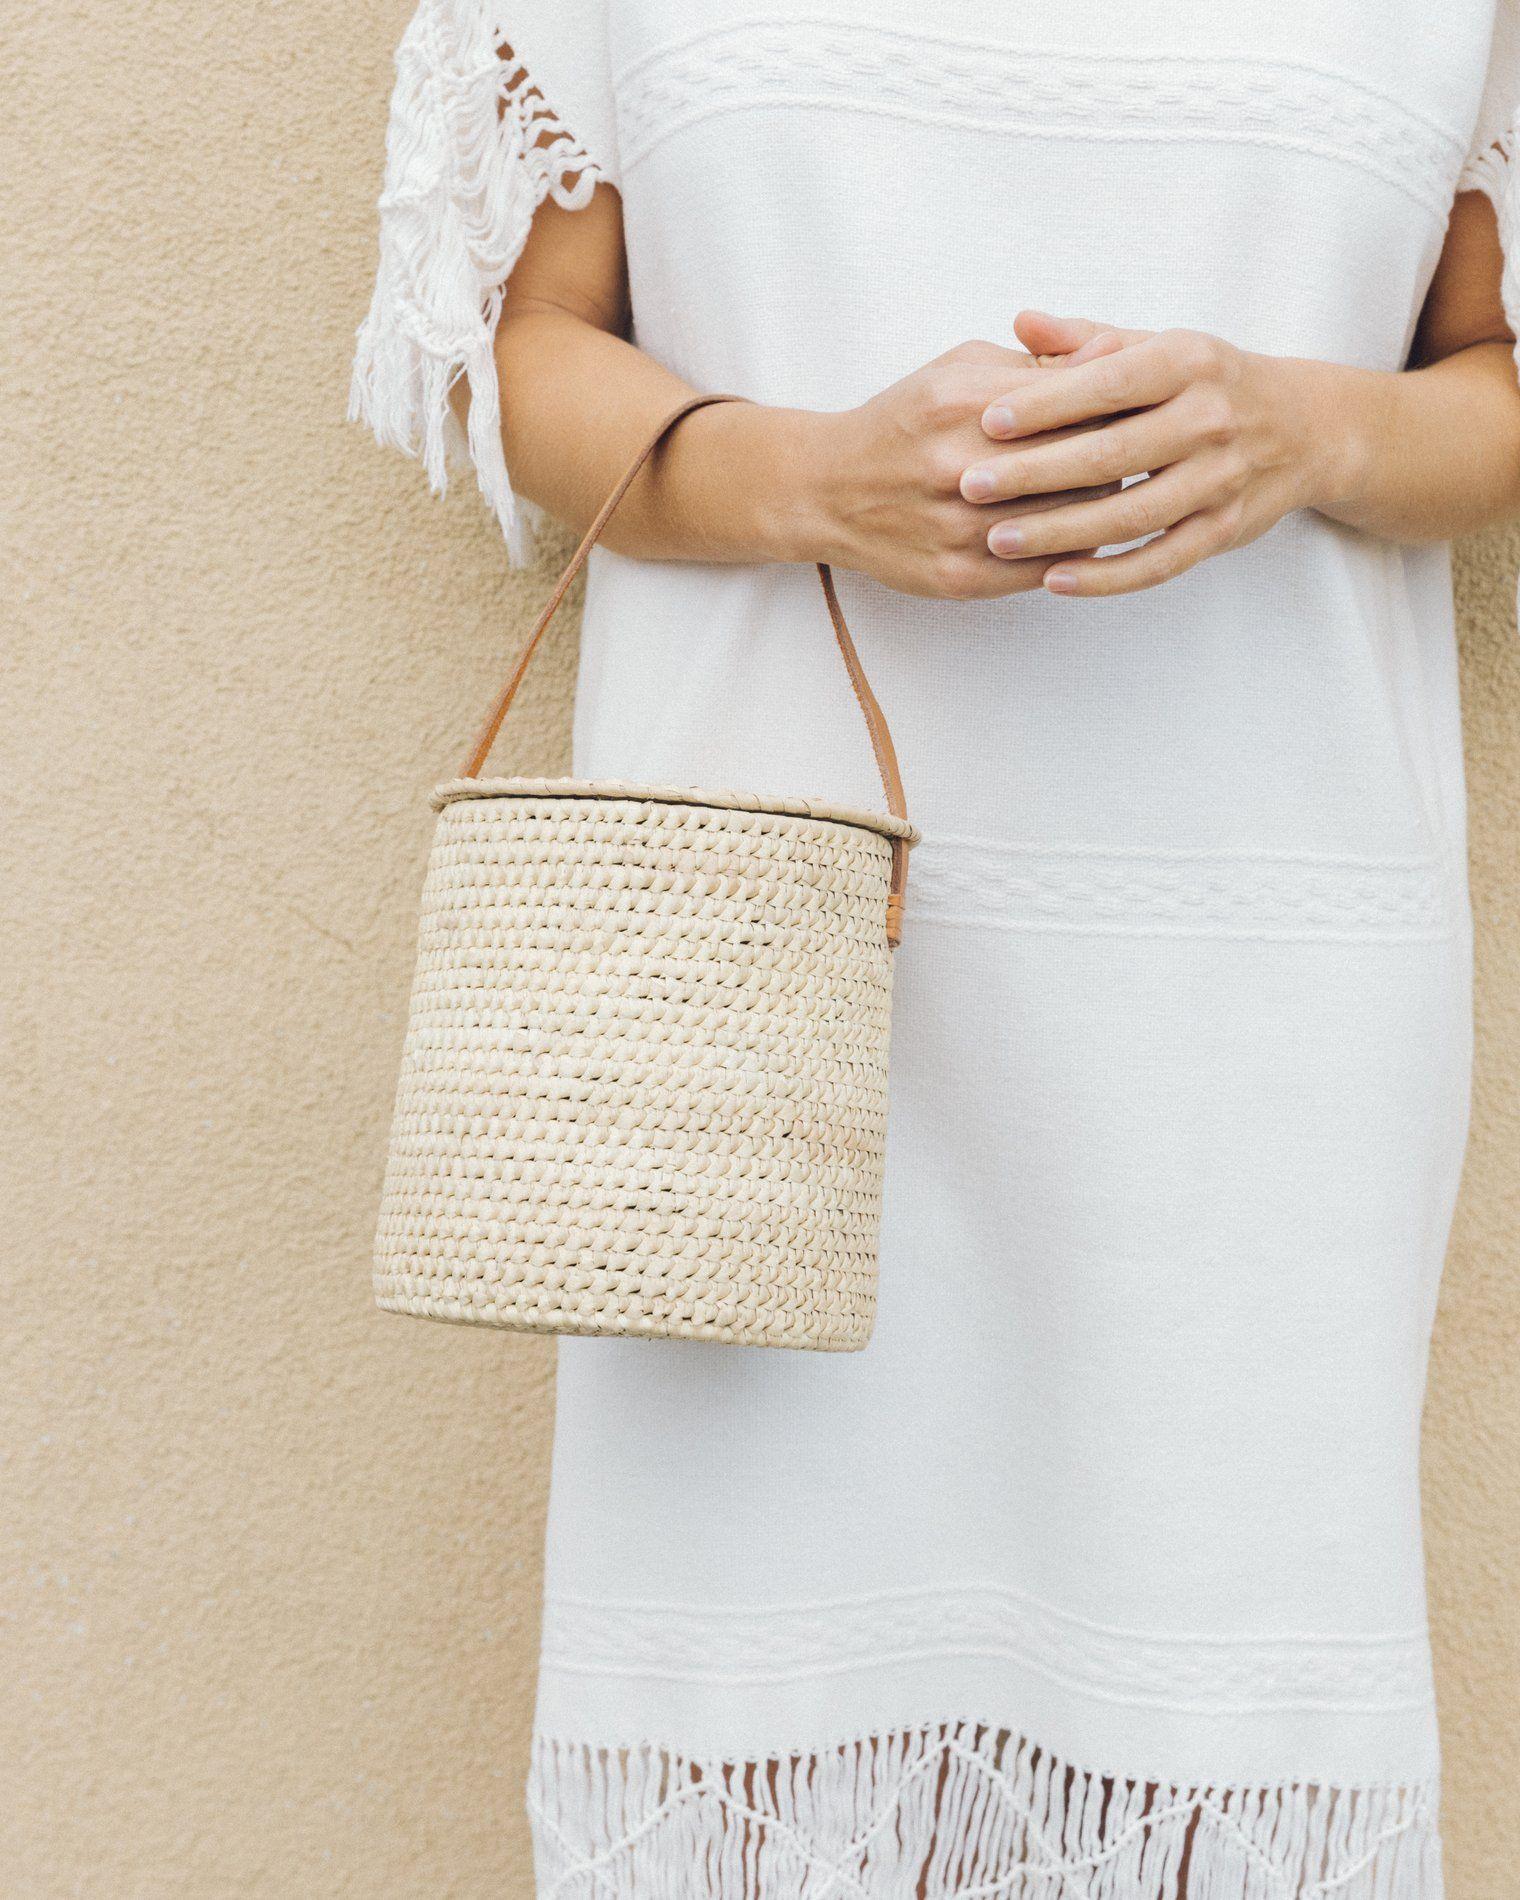 Merida Woven Bucket Bag   Buy me in 2018   Pinterest   Merida ... 8e14bc918c